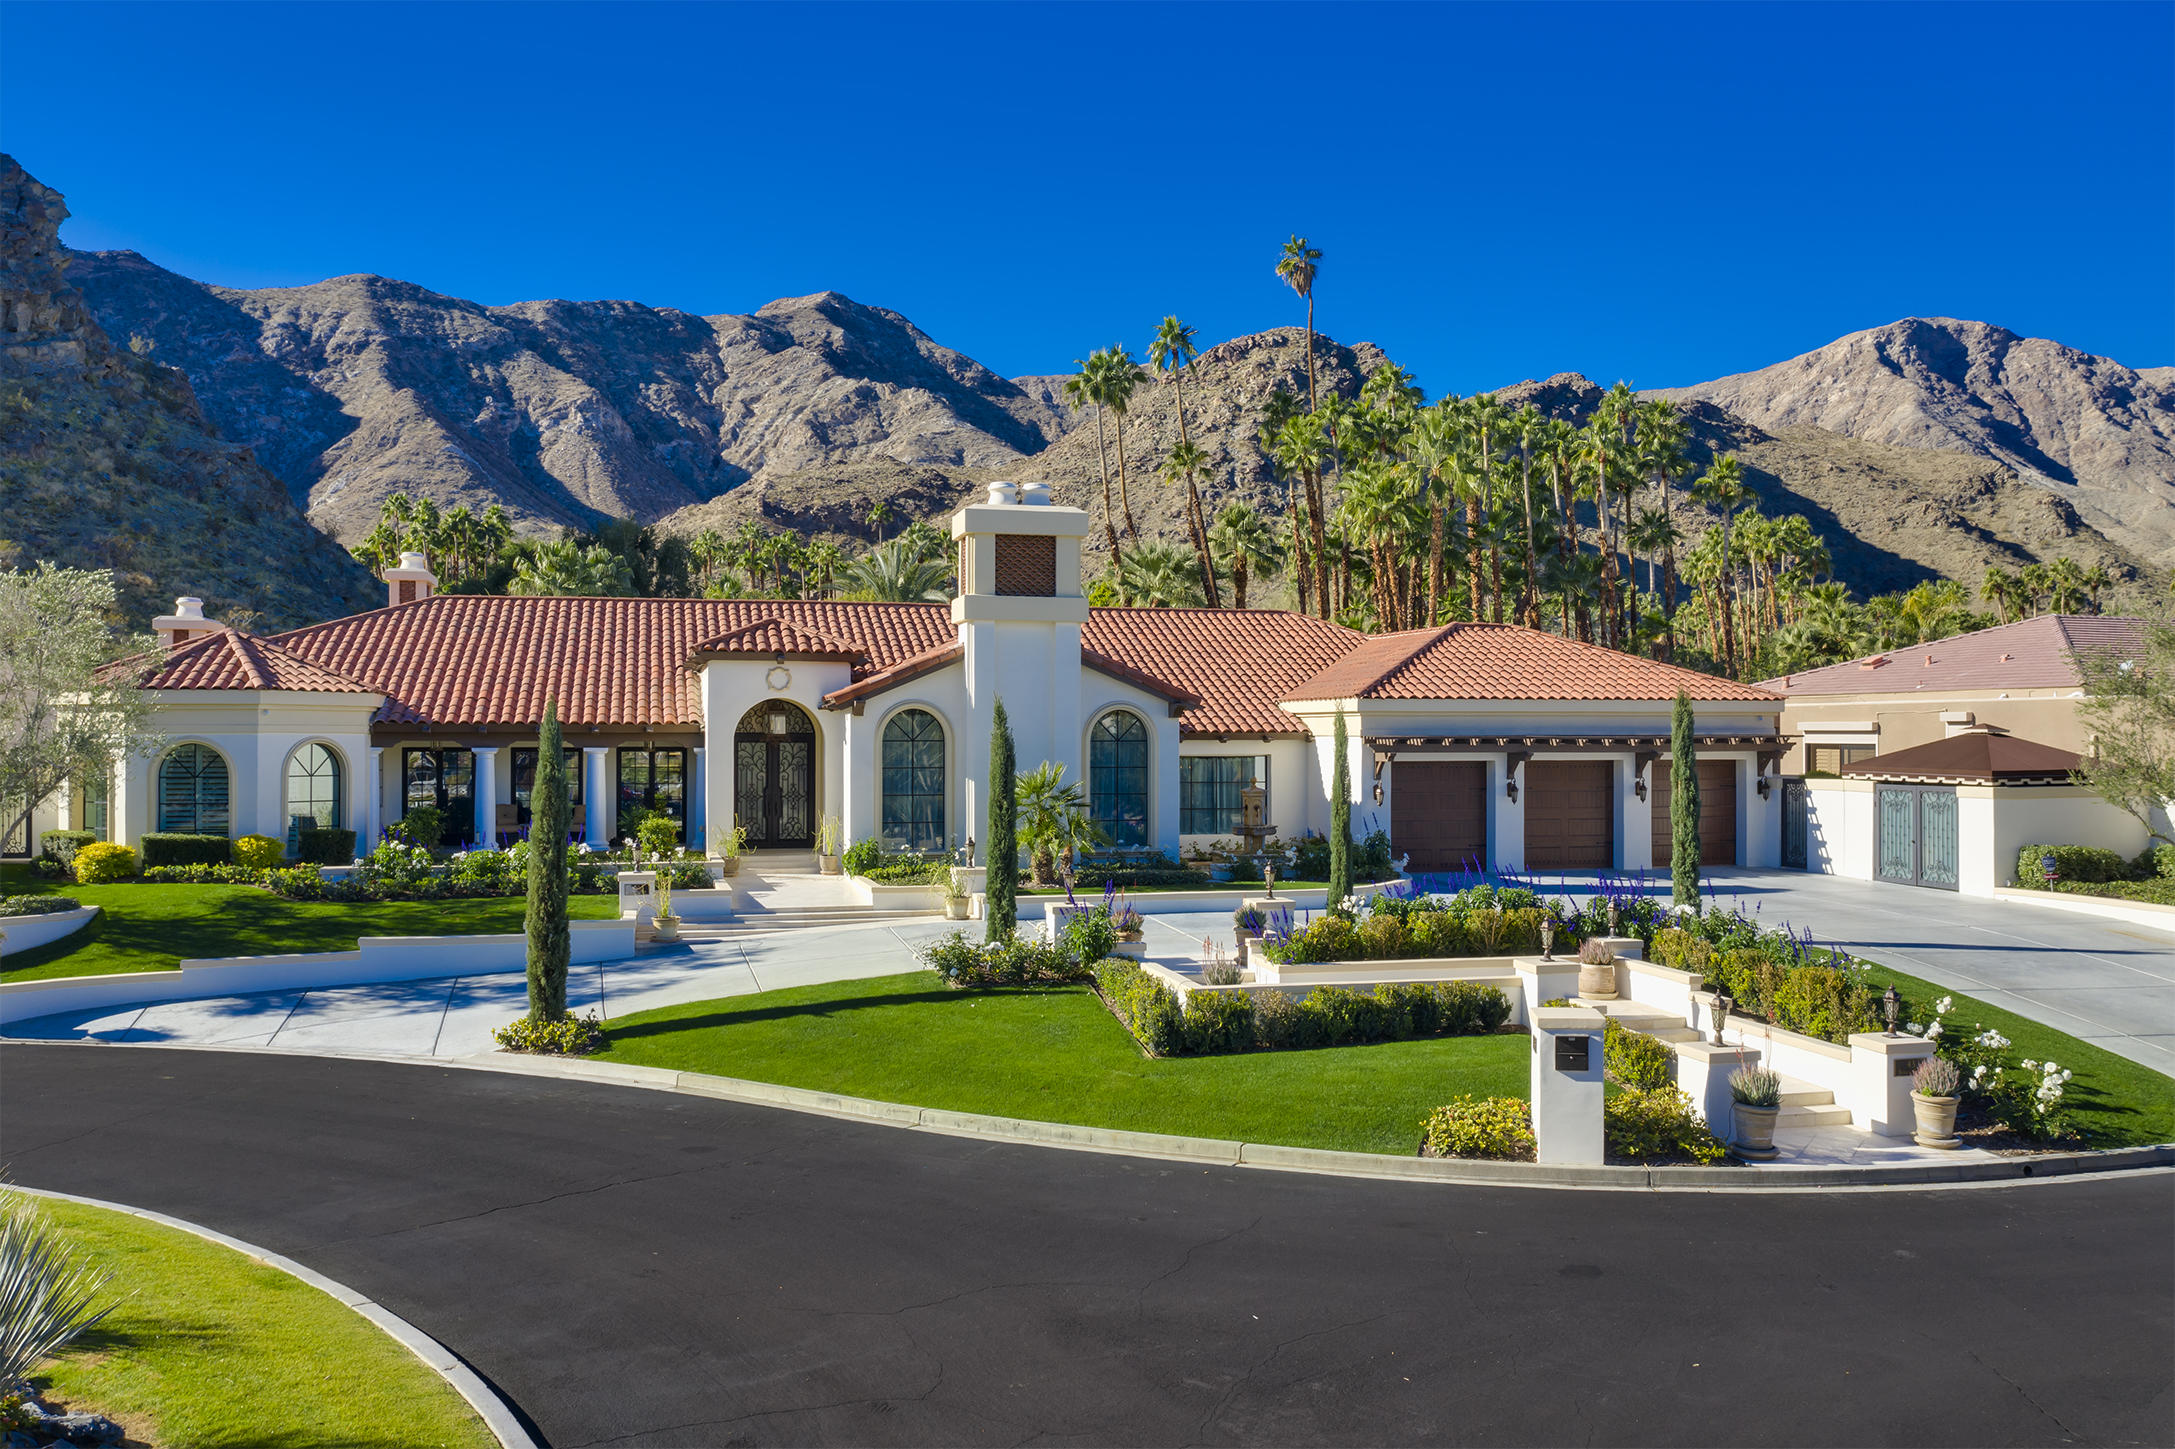 Photo of 43 Sundance Drive, Rancho Mirage, CA 92270